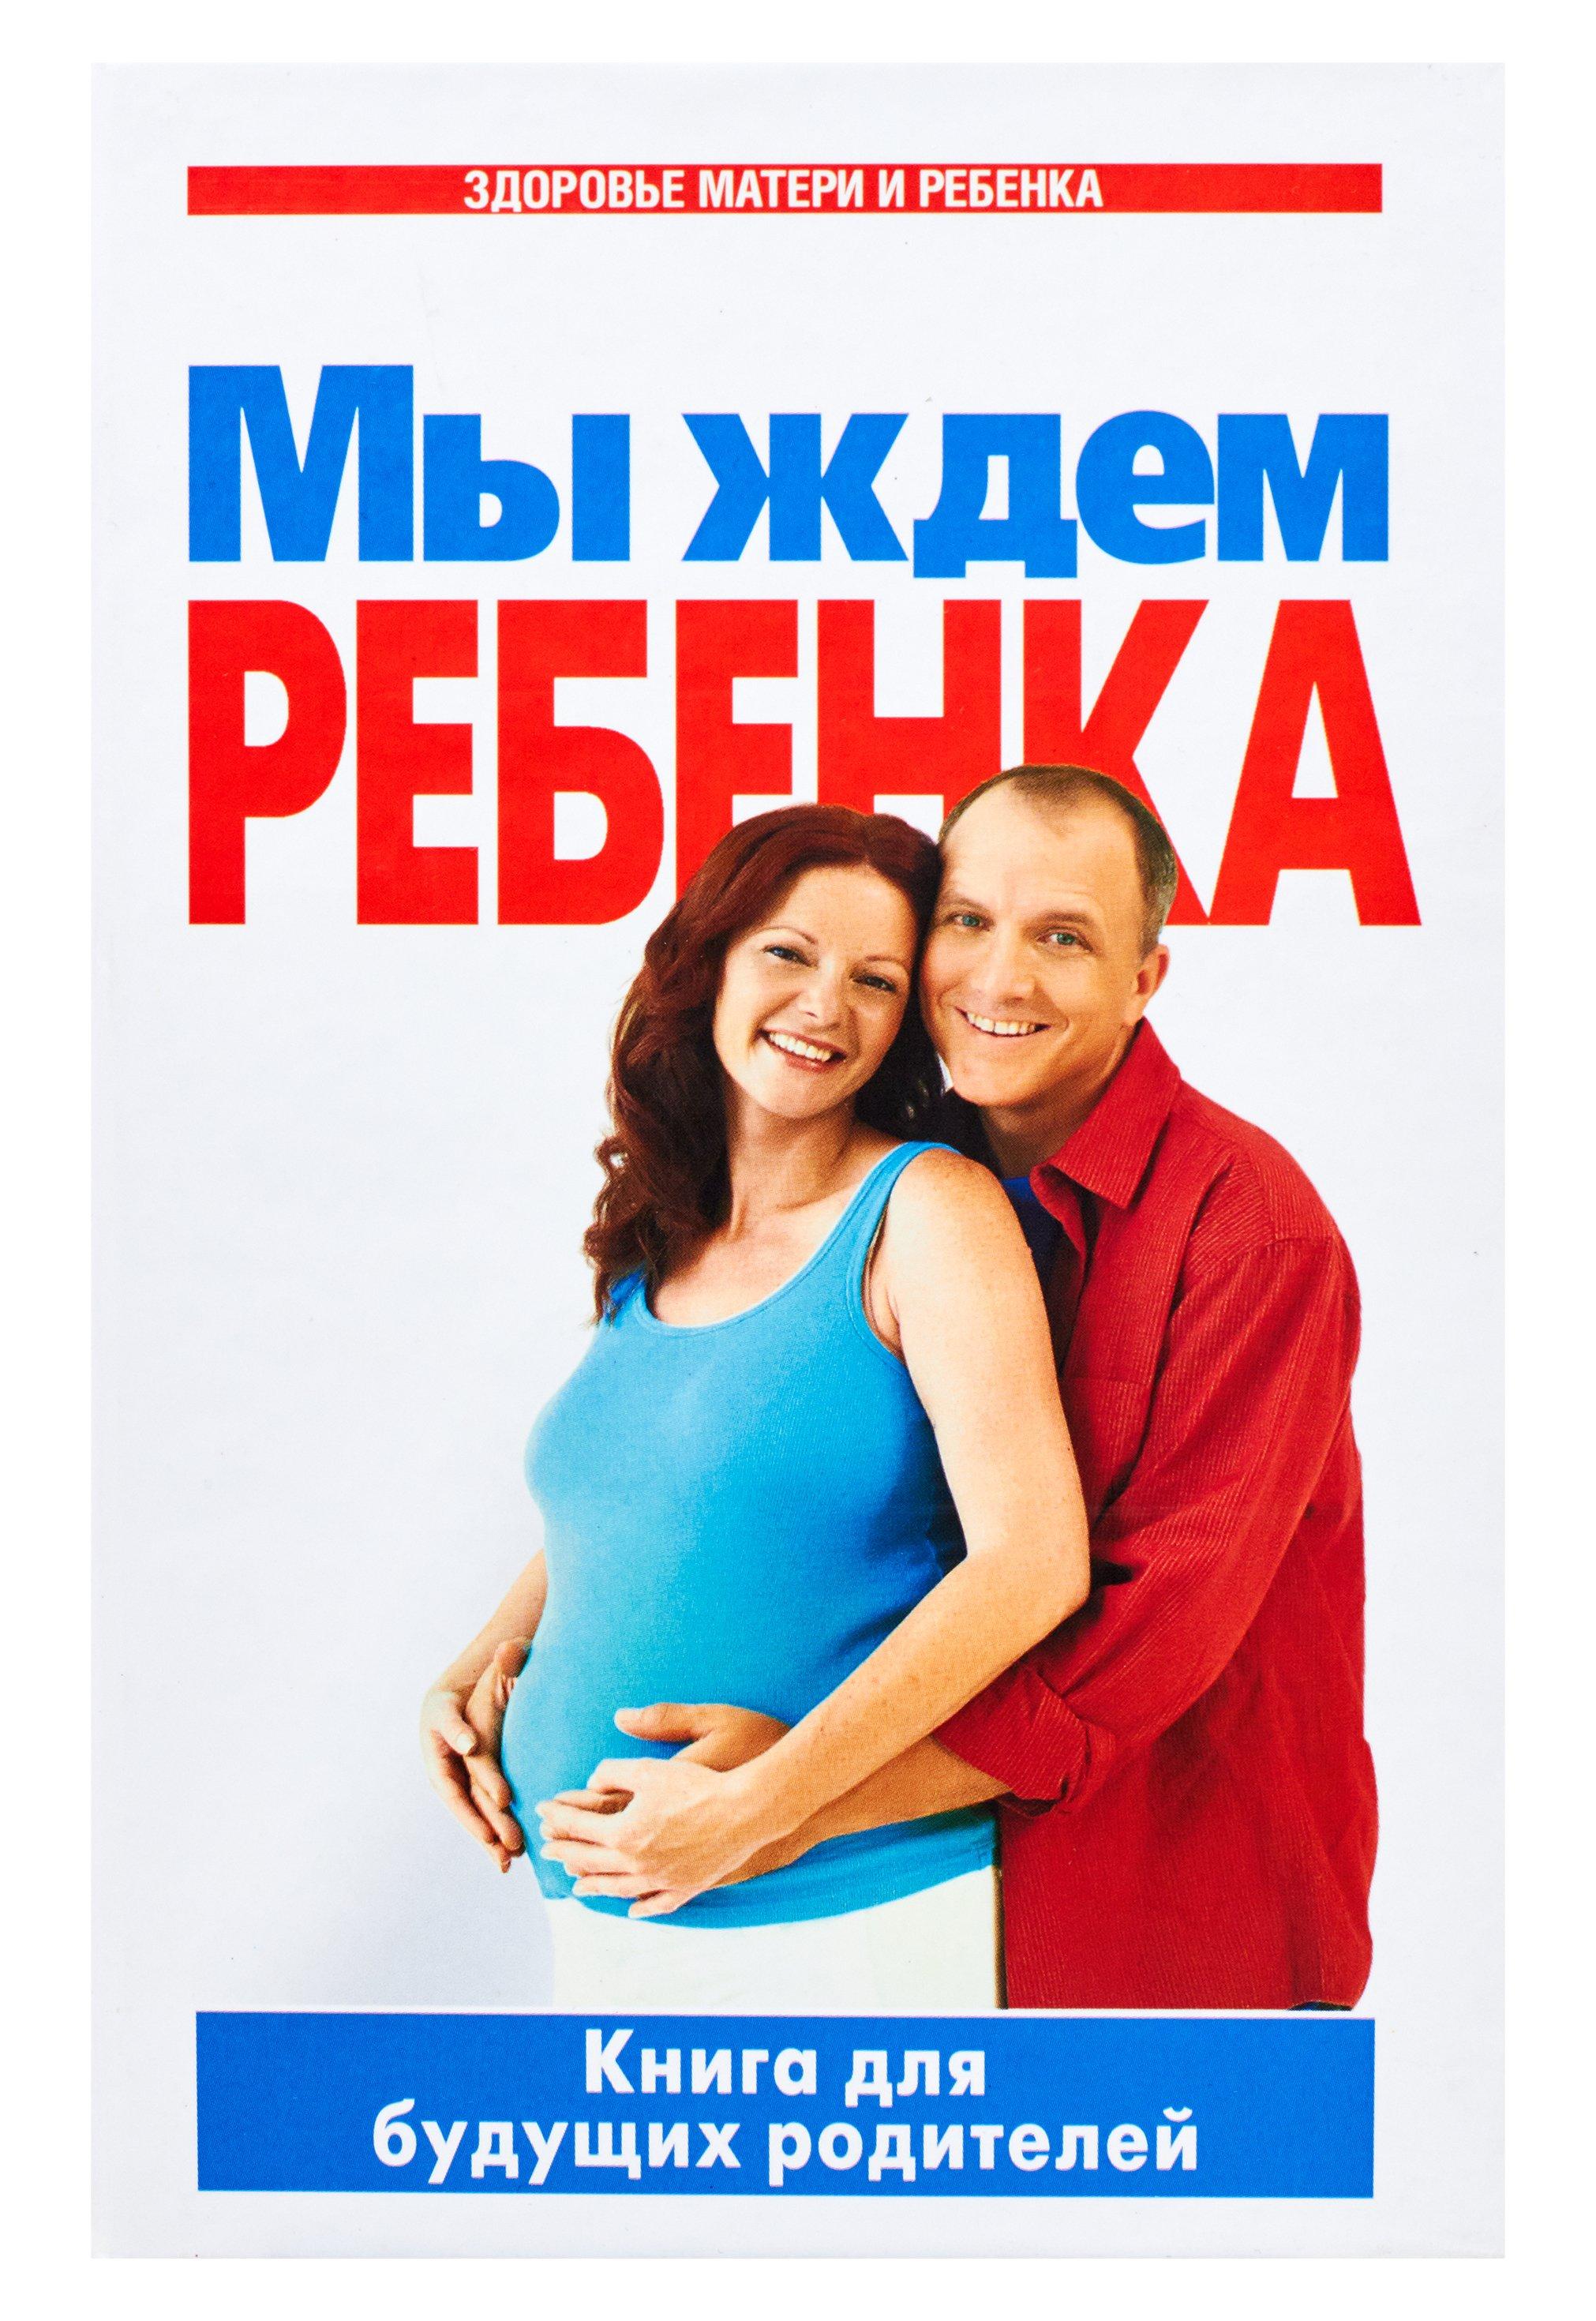 Цветкова Галина Викторовна Мы ждем ребенка стоппард мириам мы ждем ребенка